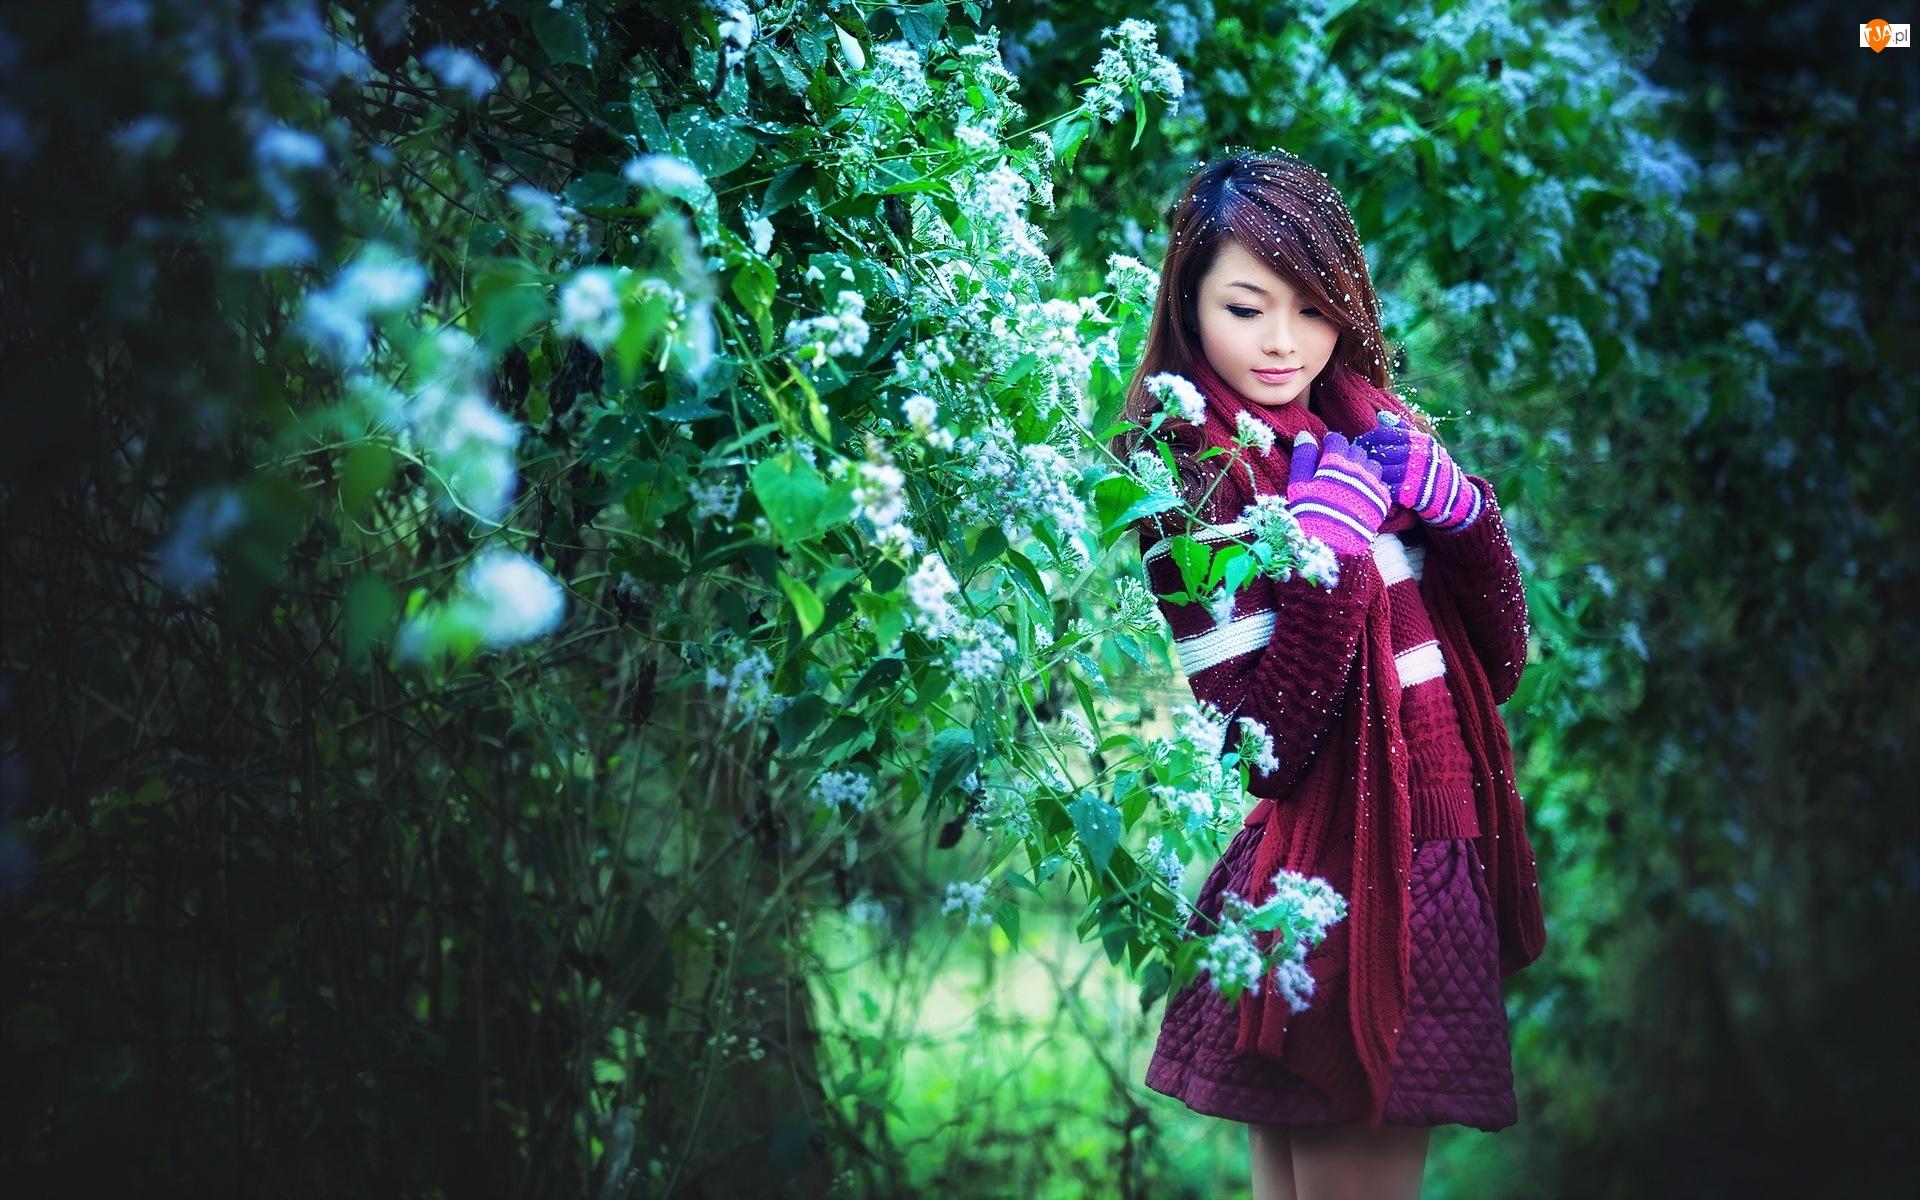 Krzewy, Tajlandzka, Park, Modelka, Kwitnące